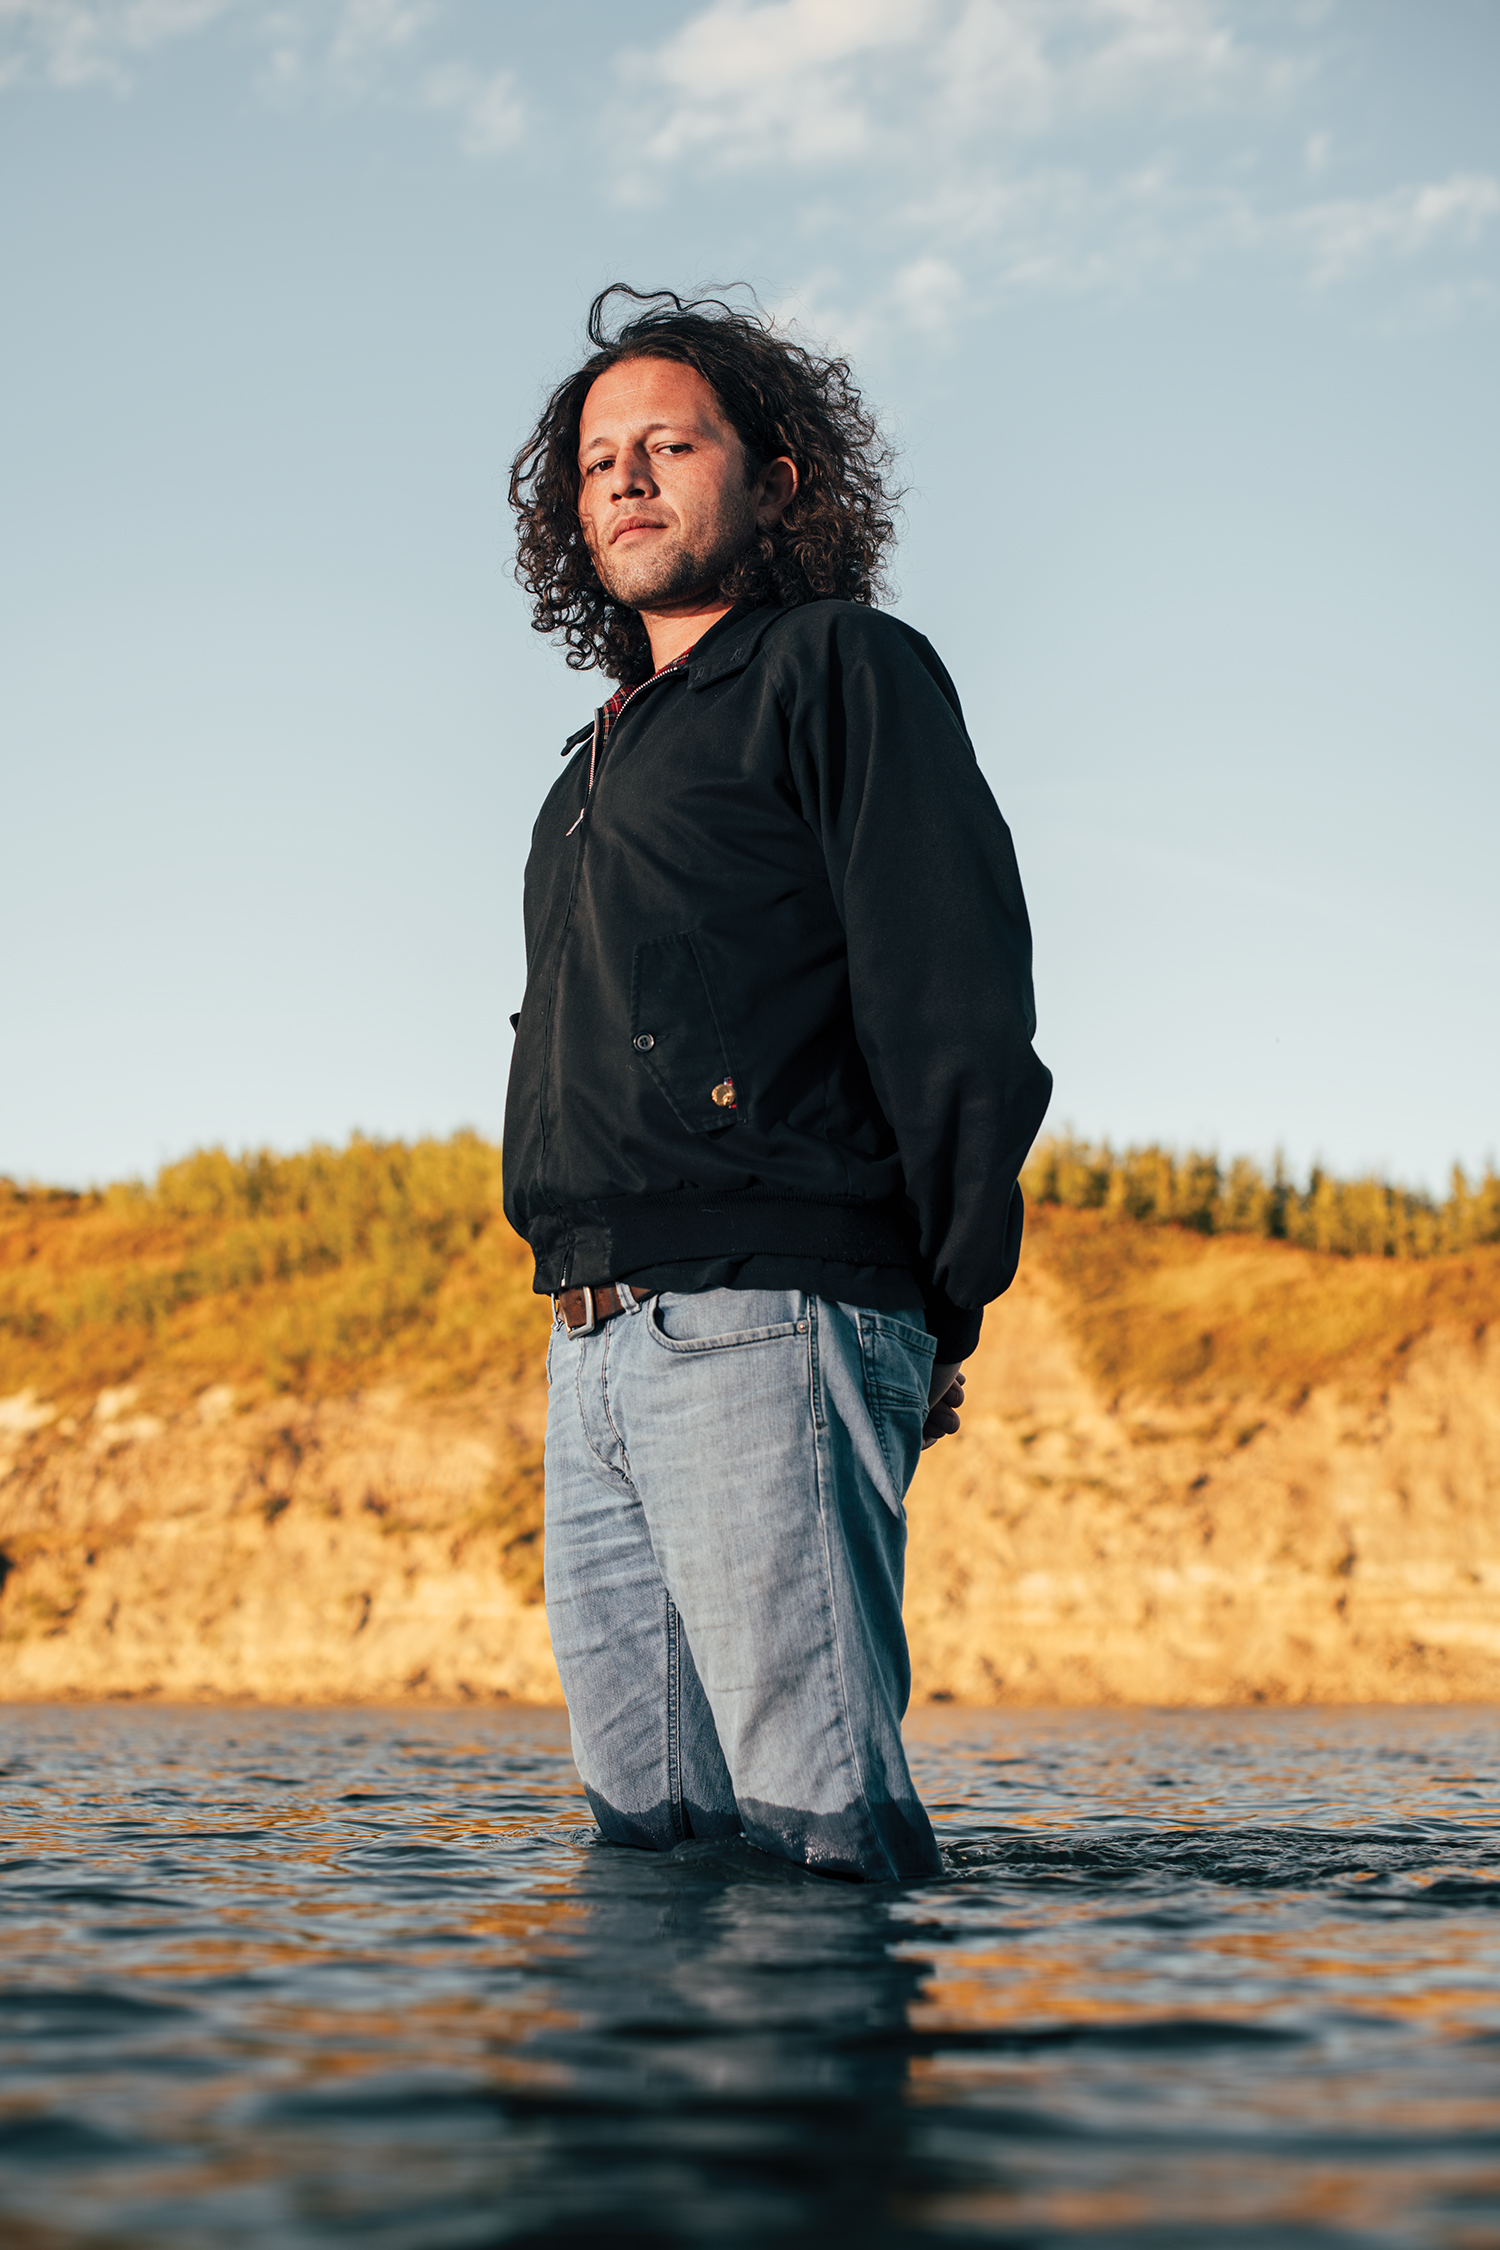 Kris Harper, founding member of nêhiyawak